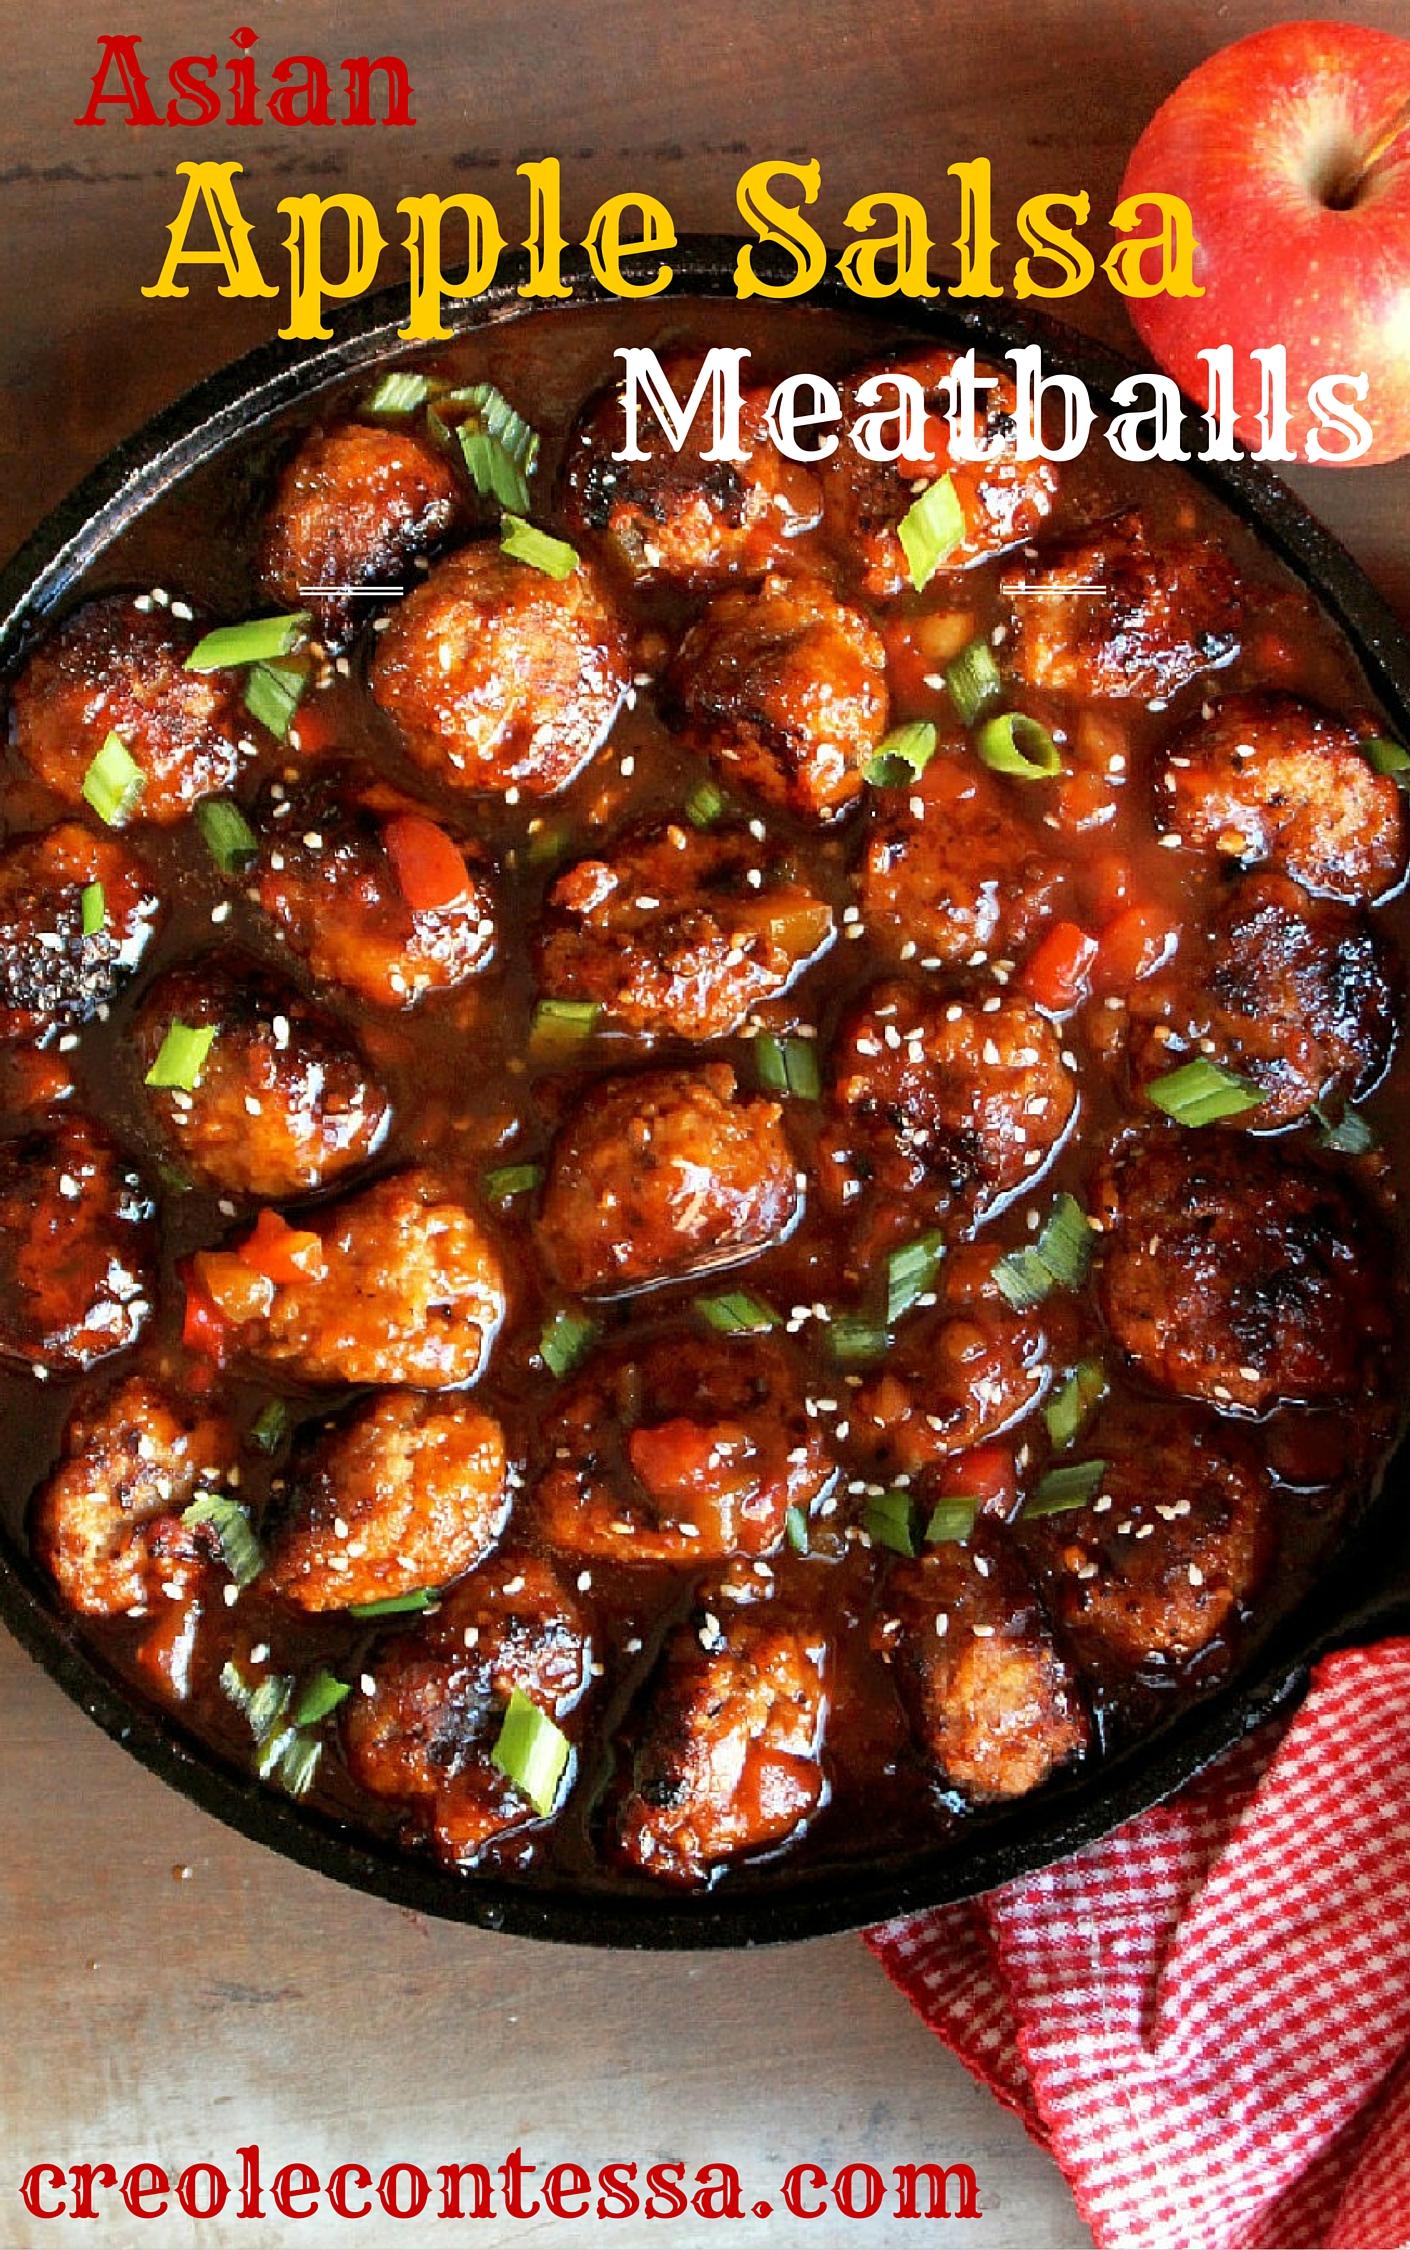 Asian Apple Salsa Meatballs -Creole Contessa